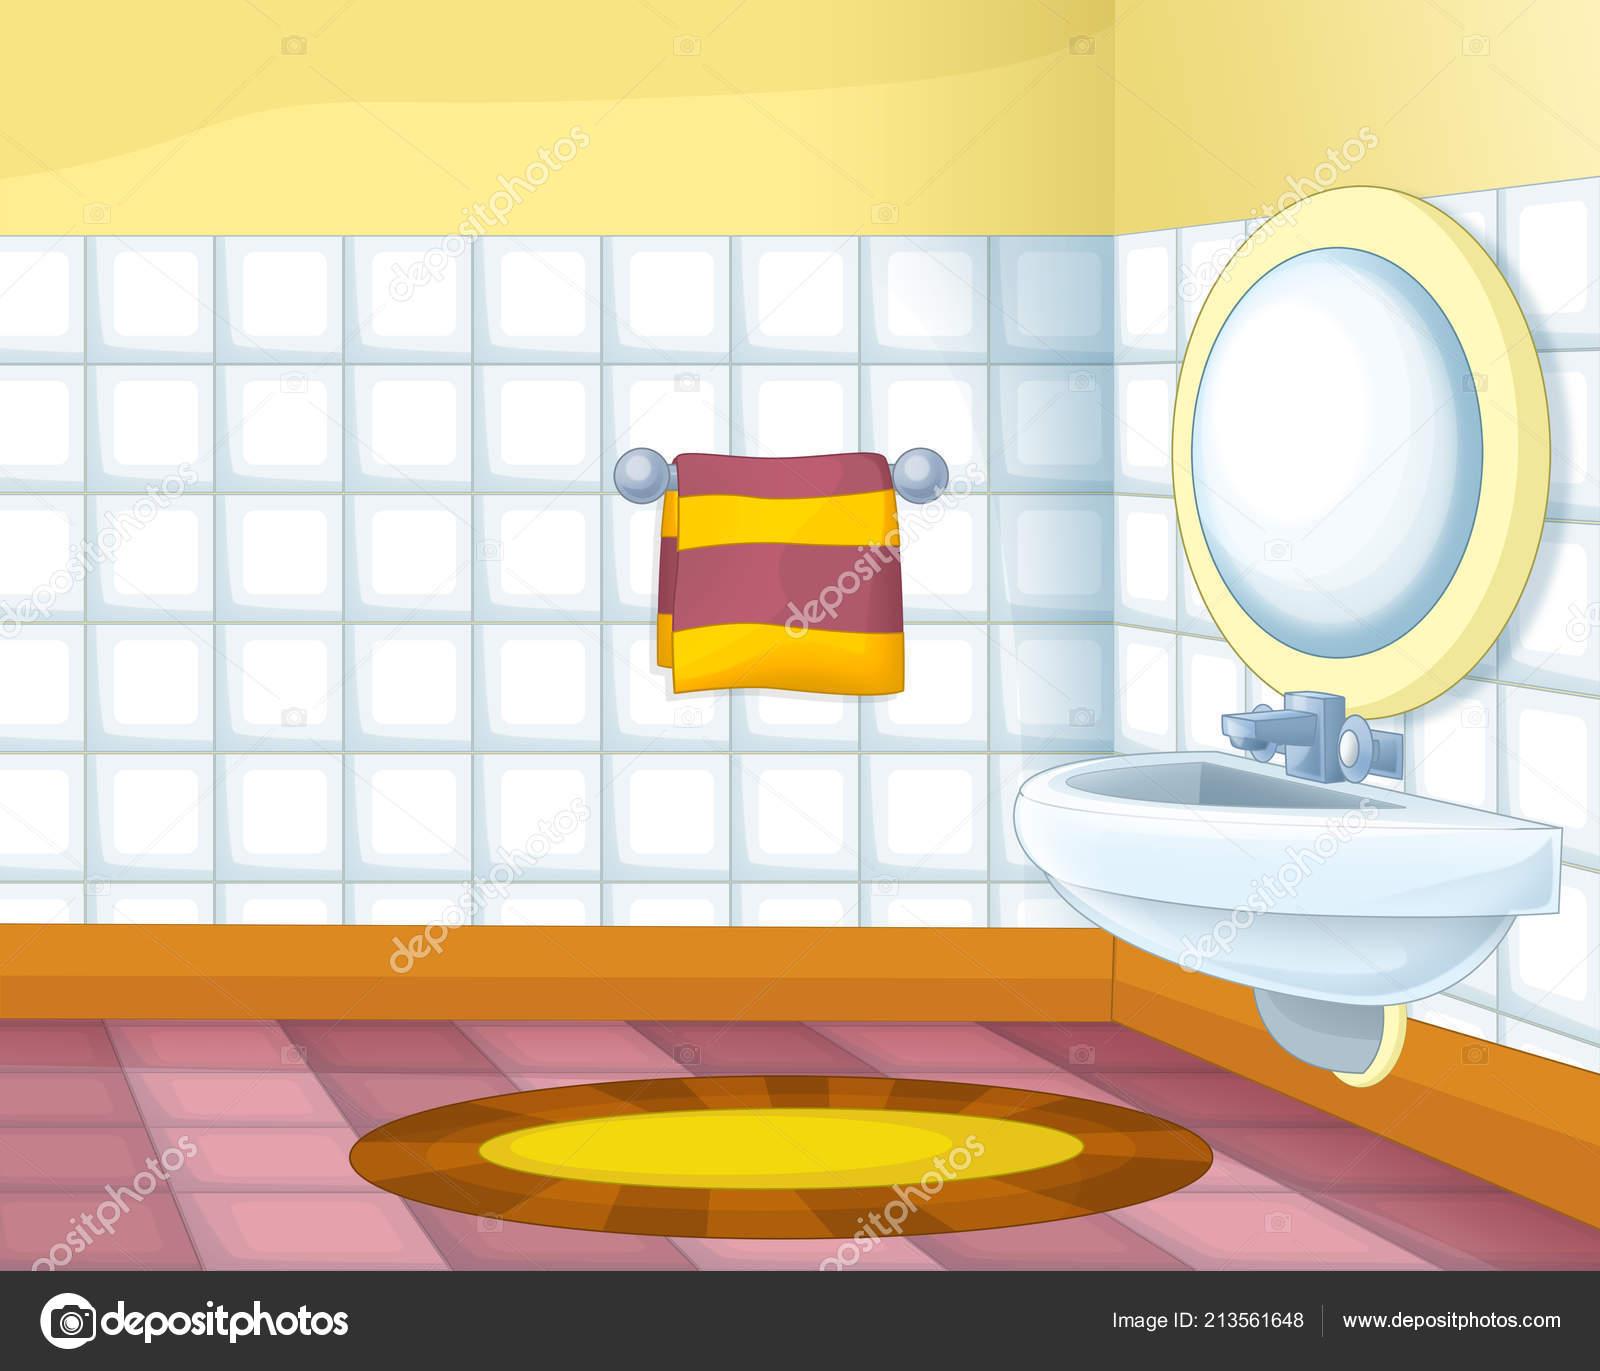 Cartoon Scene Colorful Empty Bathroom Illustration Children Stock Photo Image By Illustrator Hft 213561648